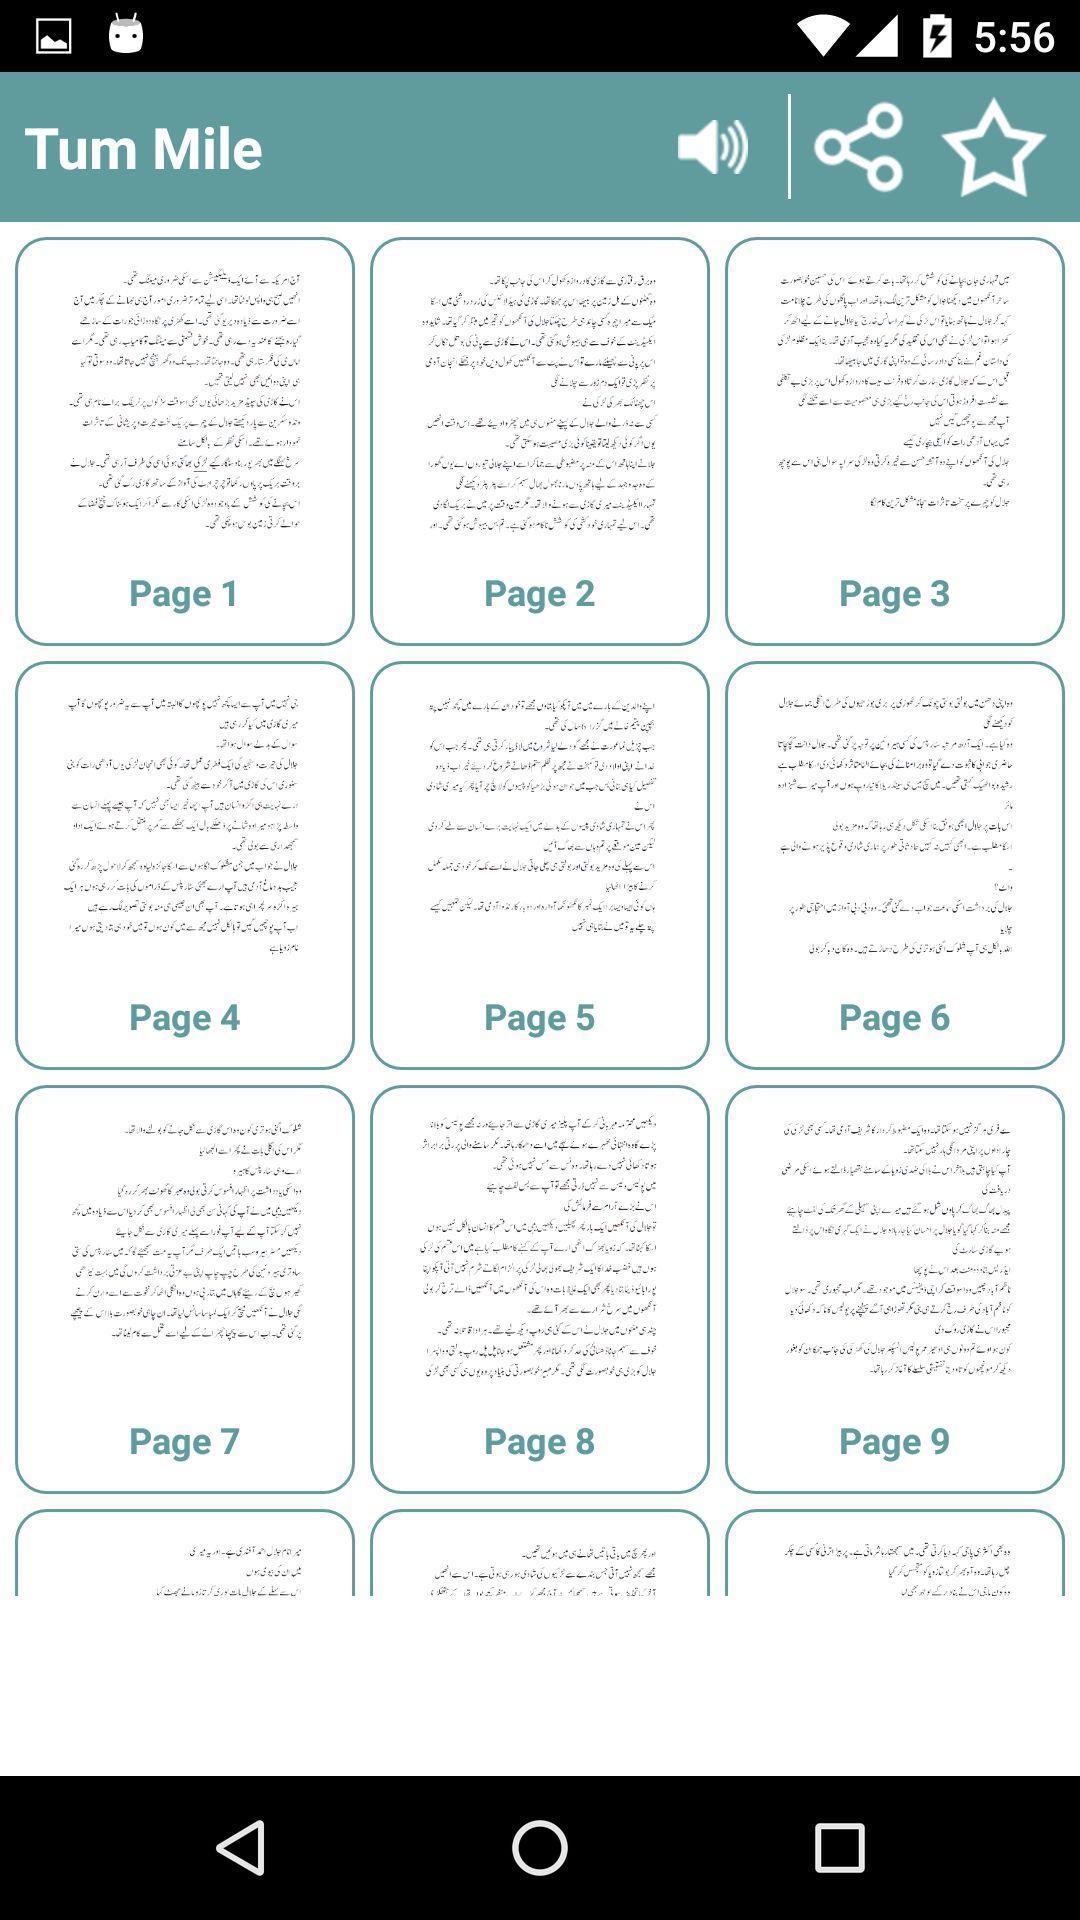 Tum Mile by Momina Jamil - Urdu Novel Offline for Android - APK Download